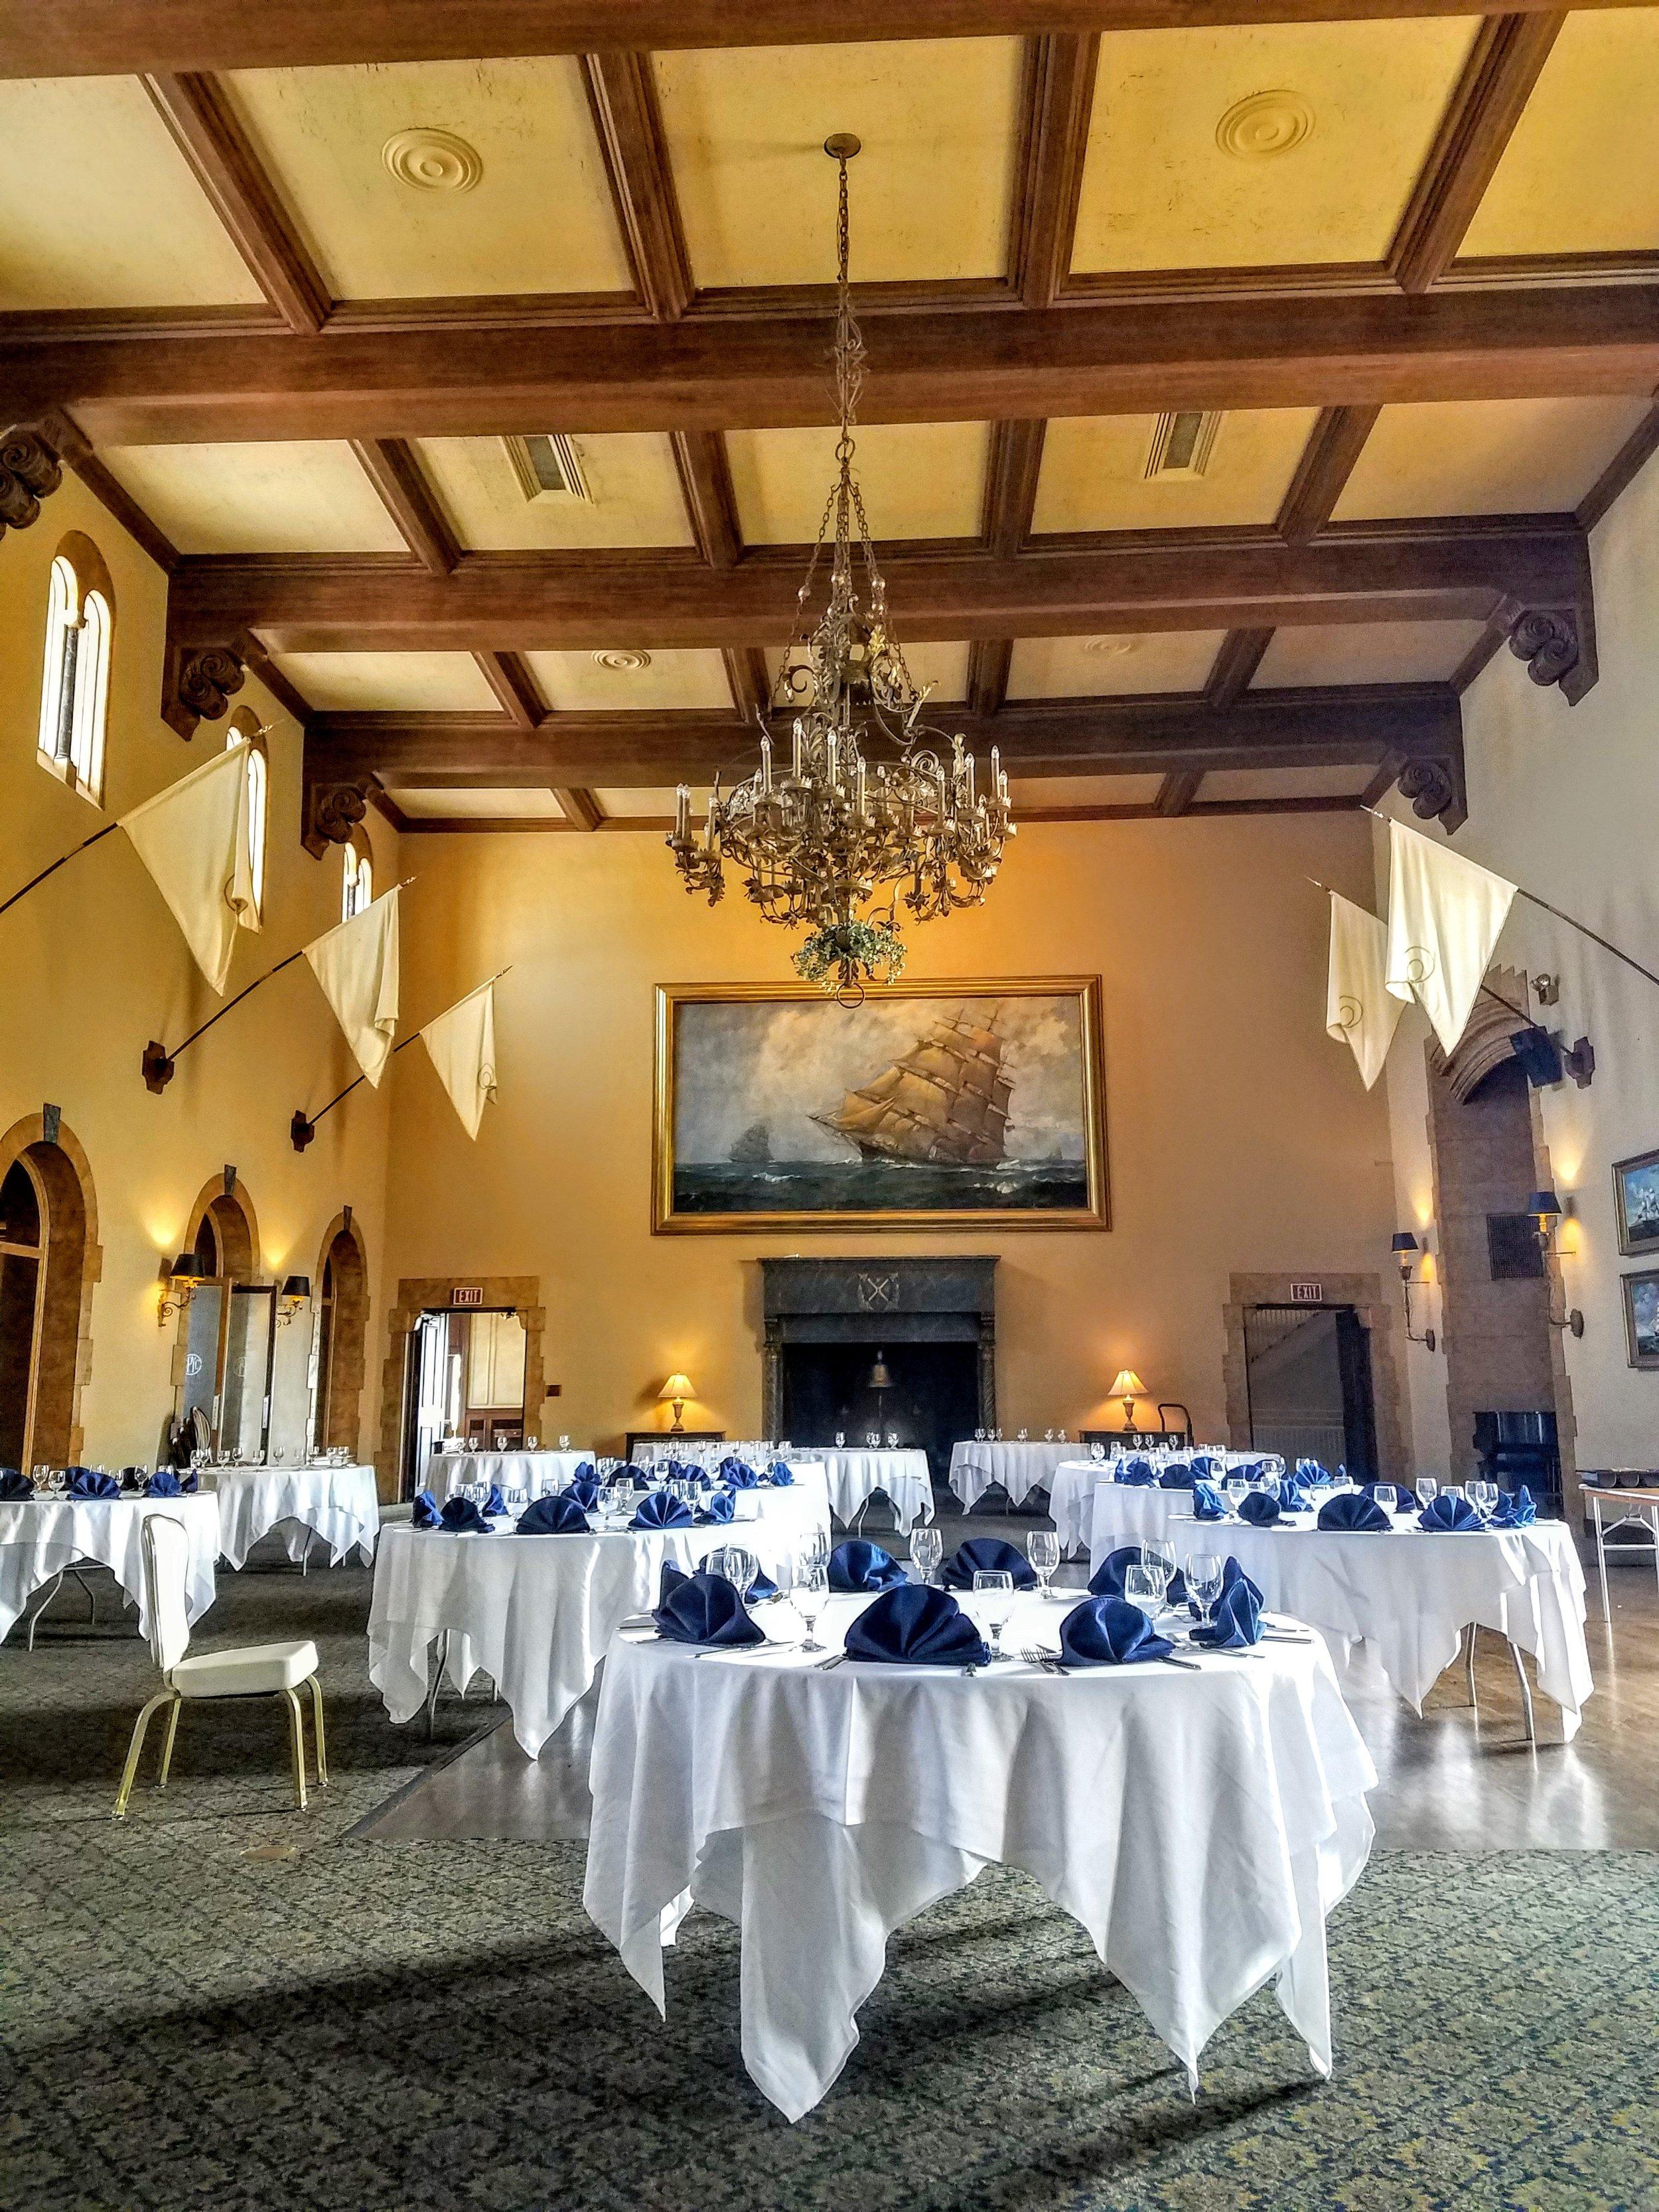 GPYC Grand Dining Room